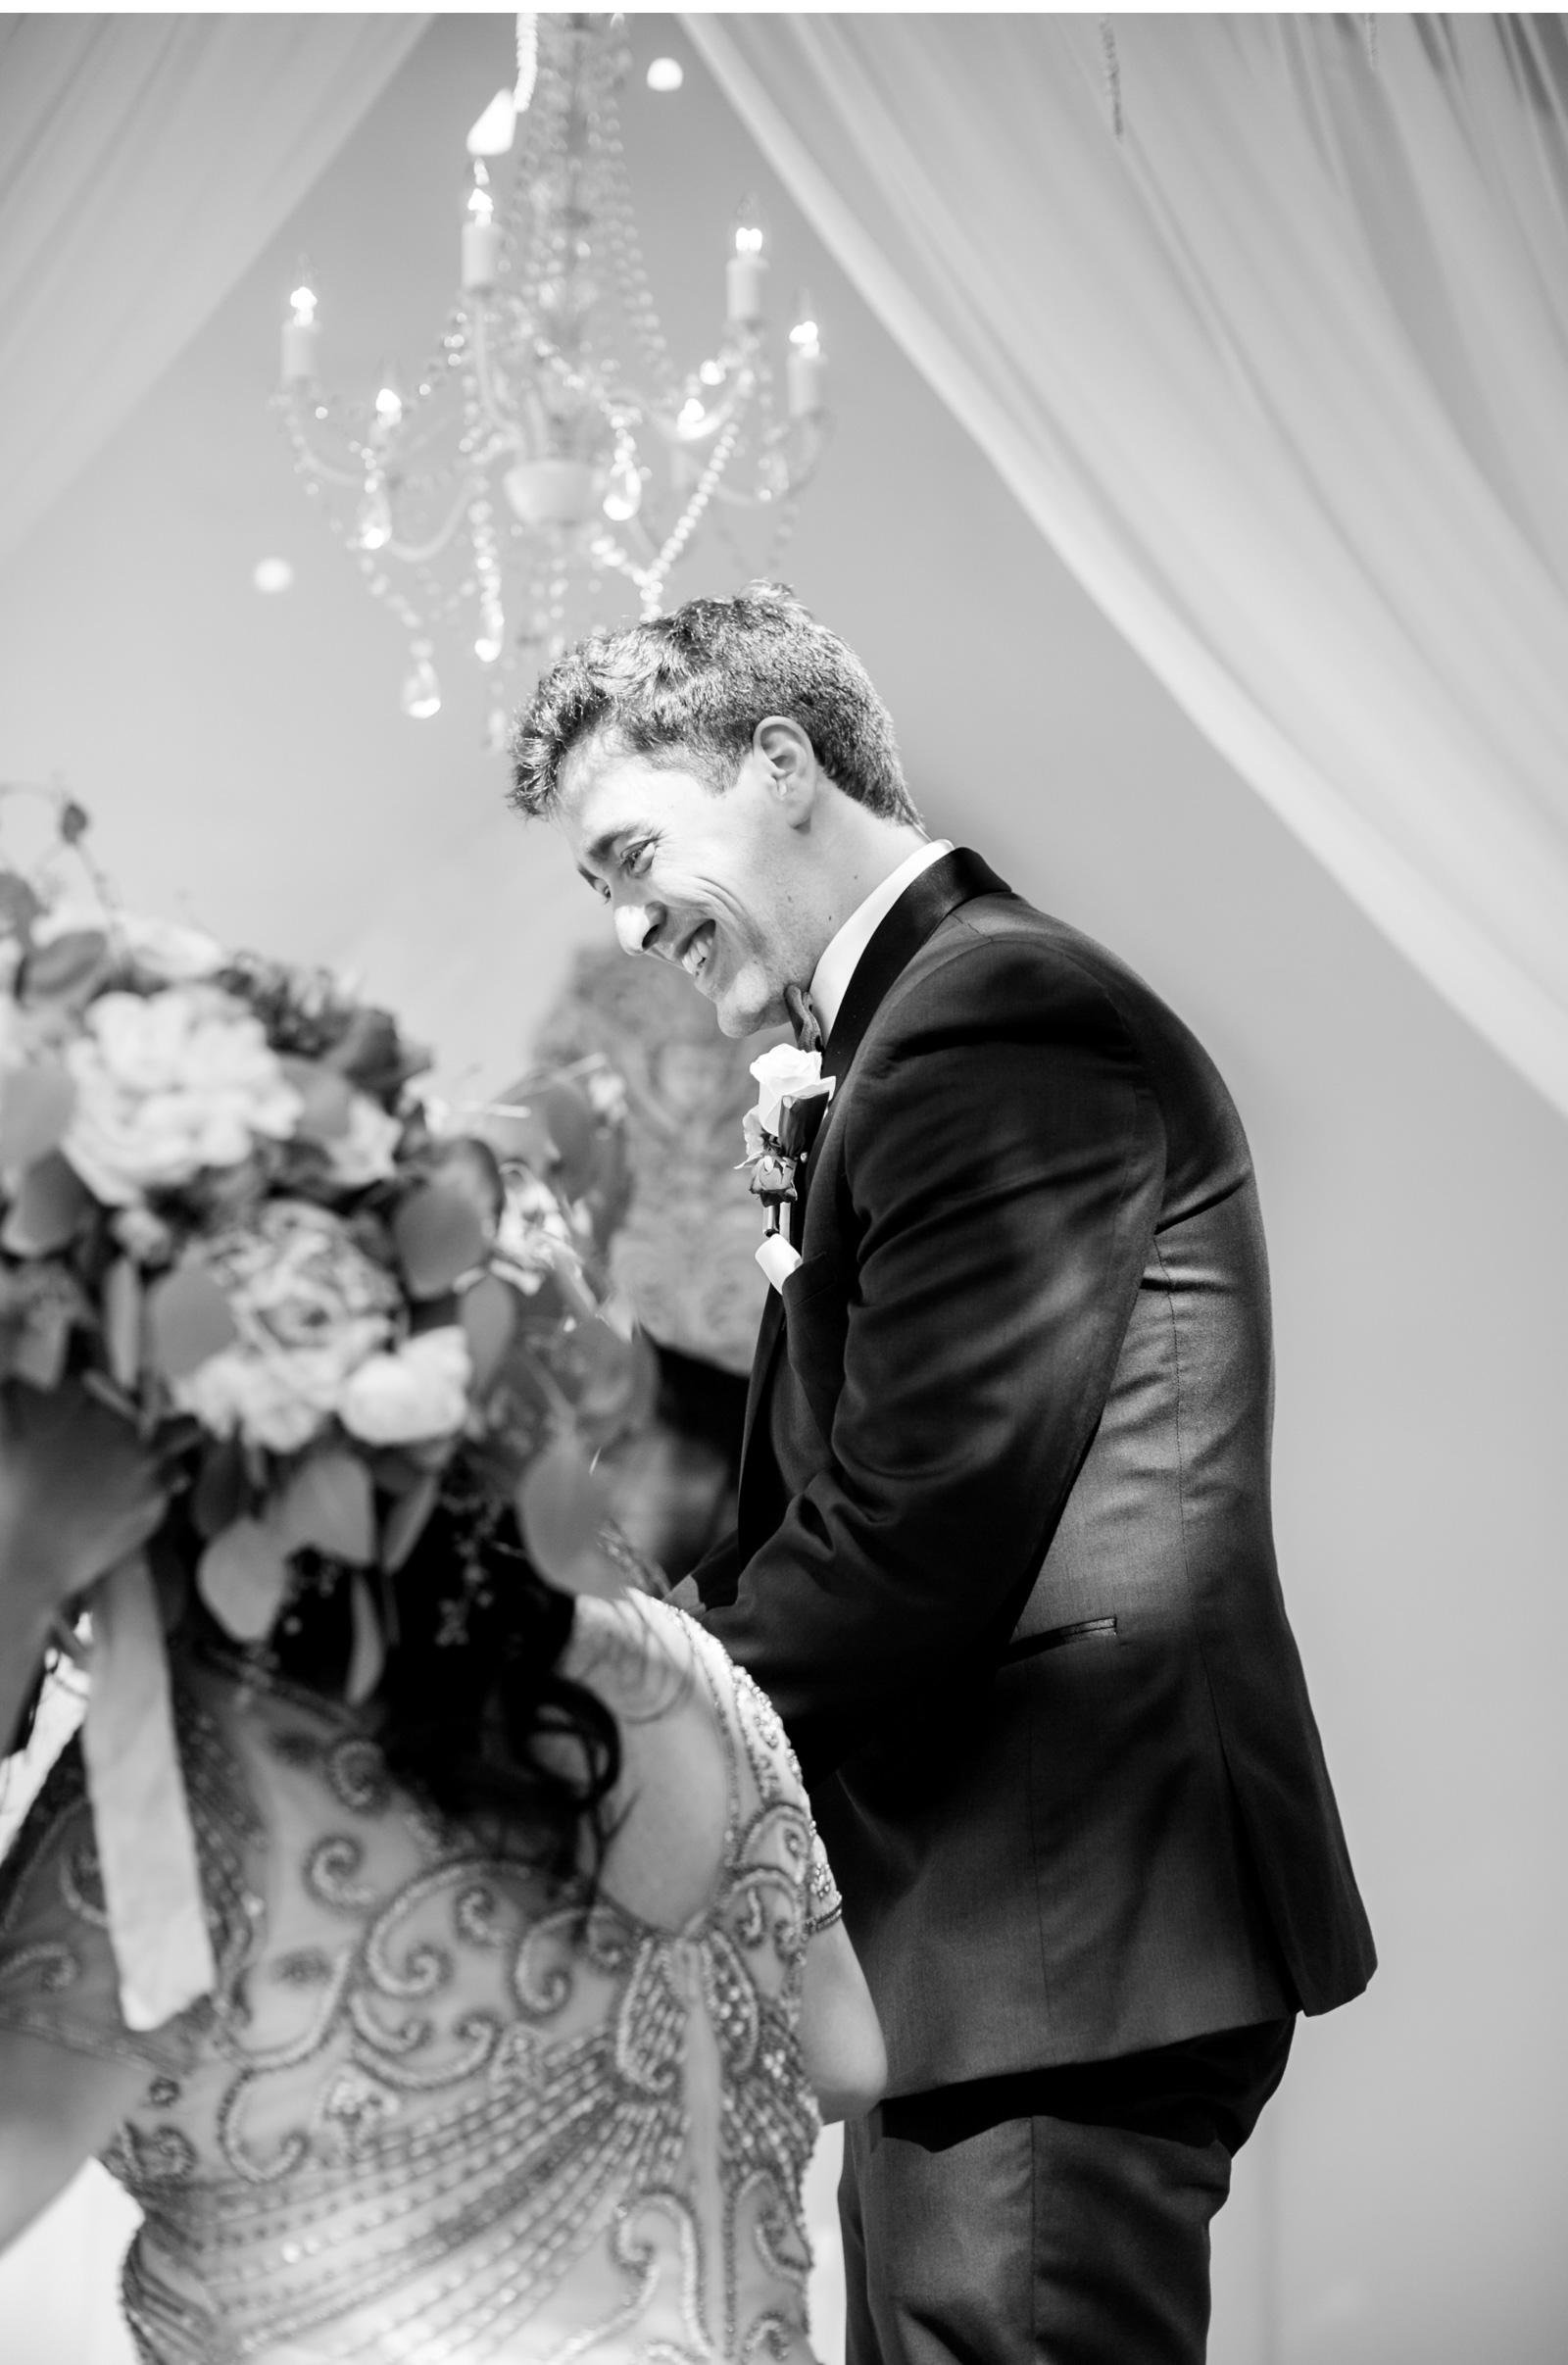 Malibu-Wedding-Triunfo-Creek-Natalie-Schutt-Photography_06.jpg